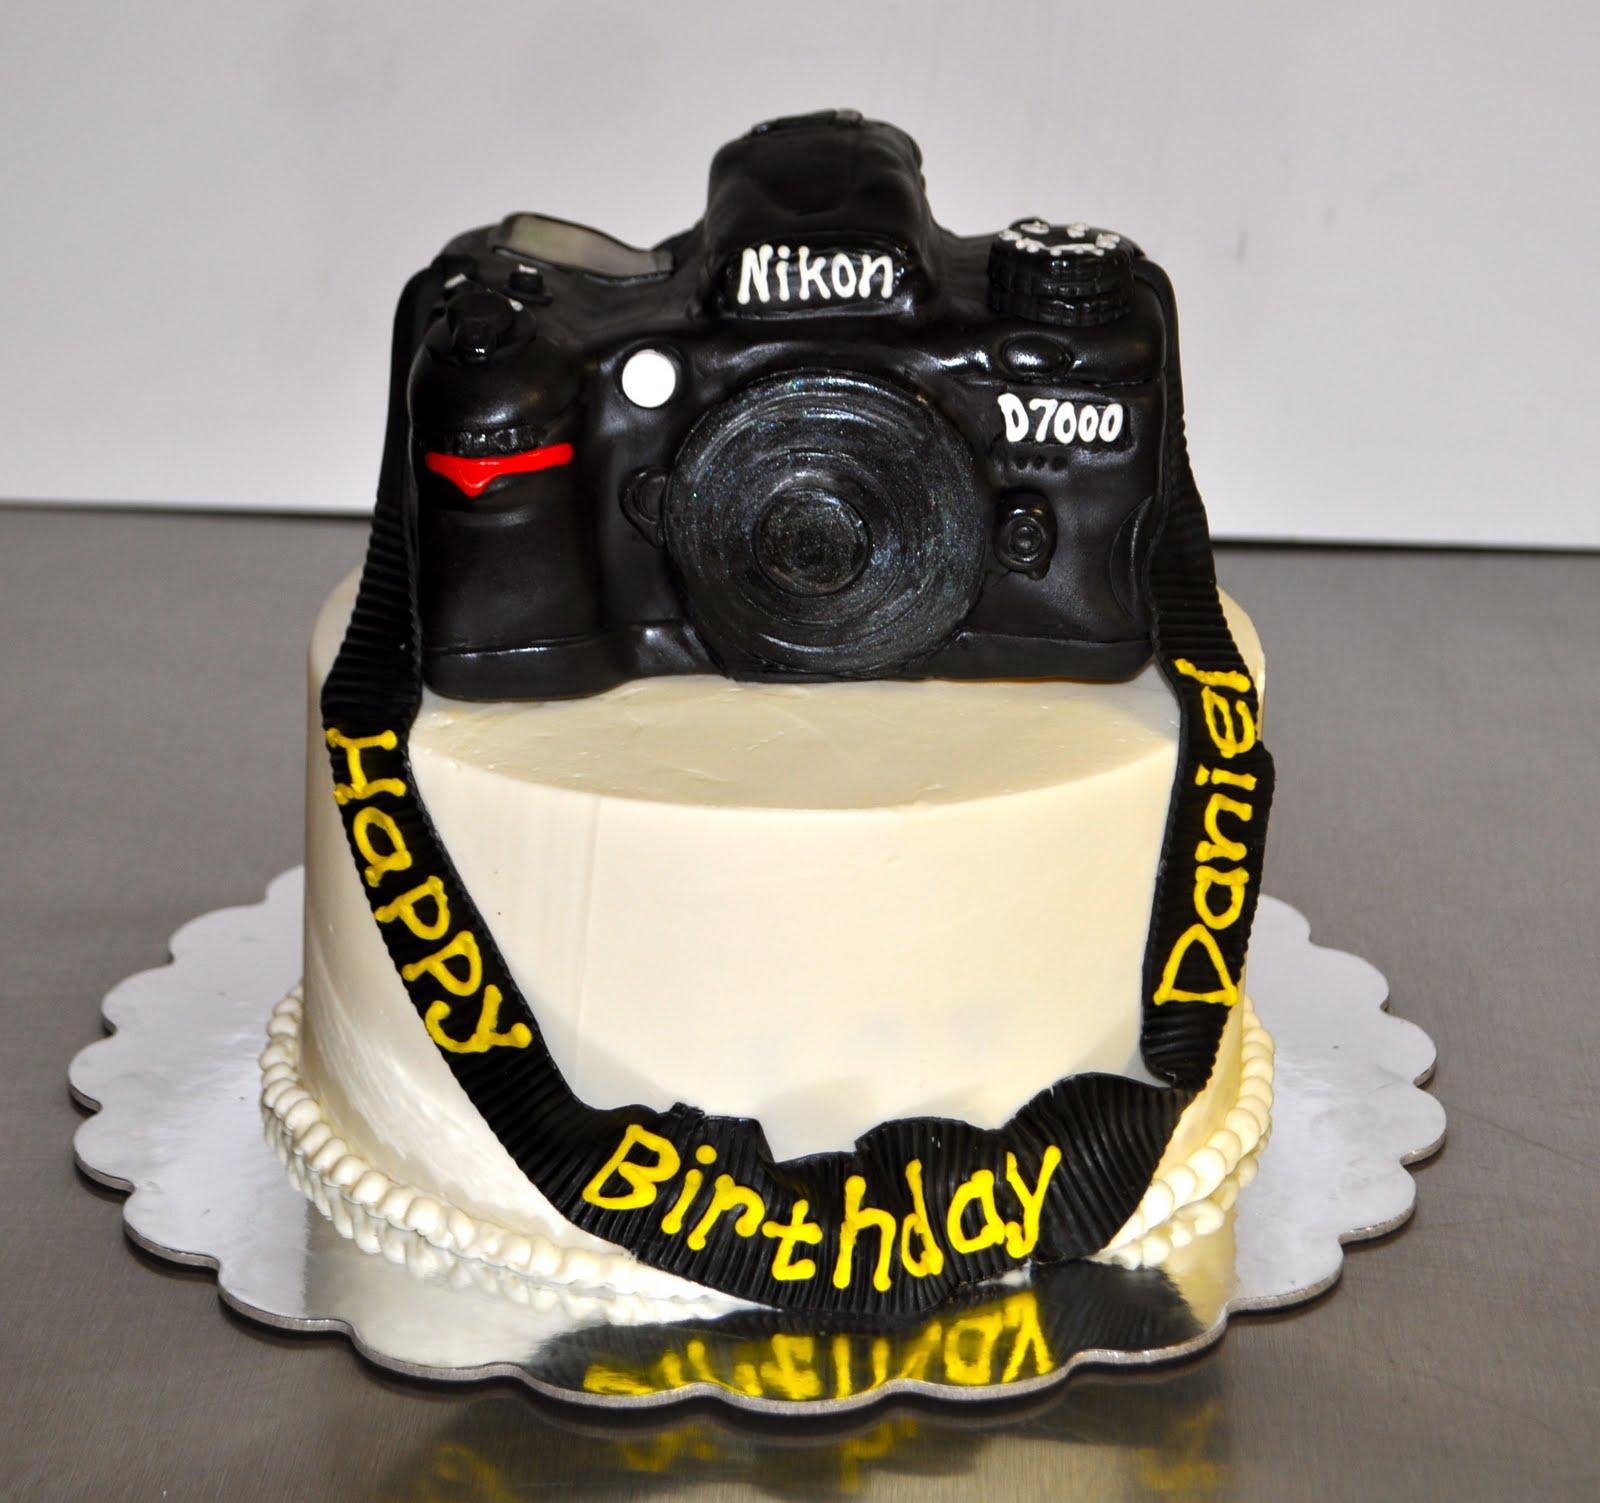 Awe Inspiring Leahs Sweet Treats Nikon D7000 Camera Cake Personalised Birthday Cards Sponlily Jamesorg